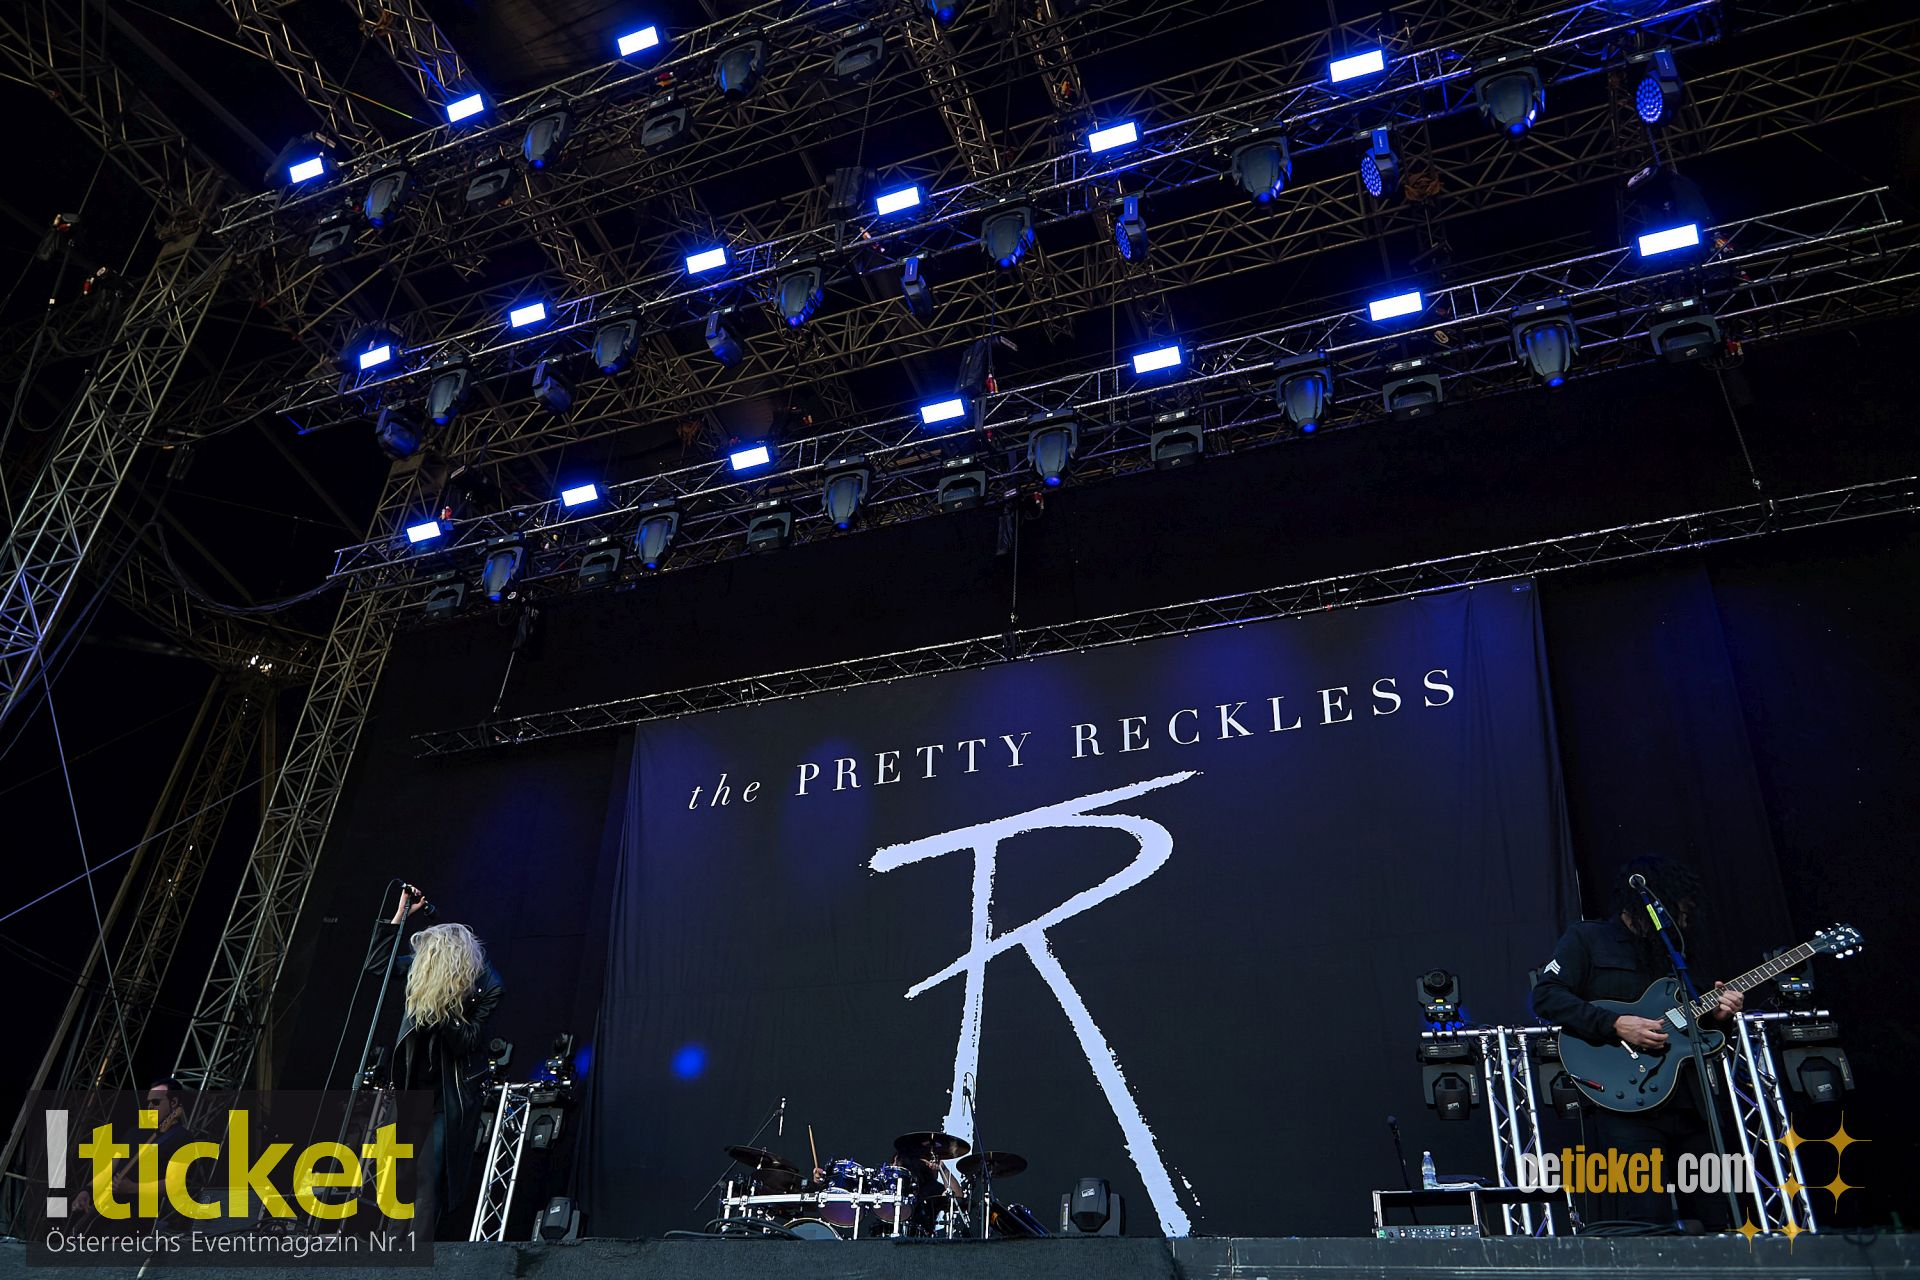 ThePrettyReckless